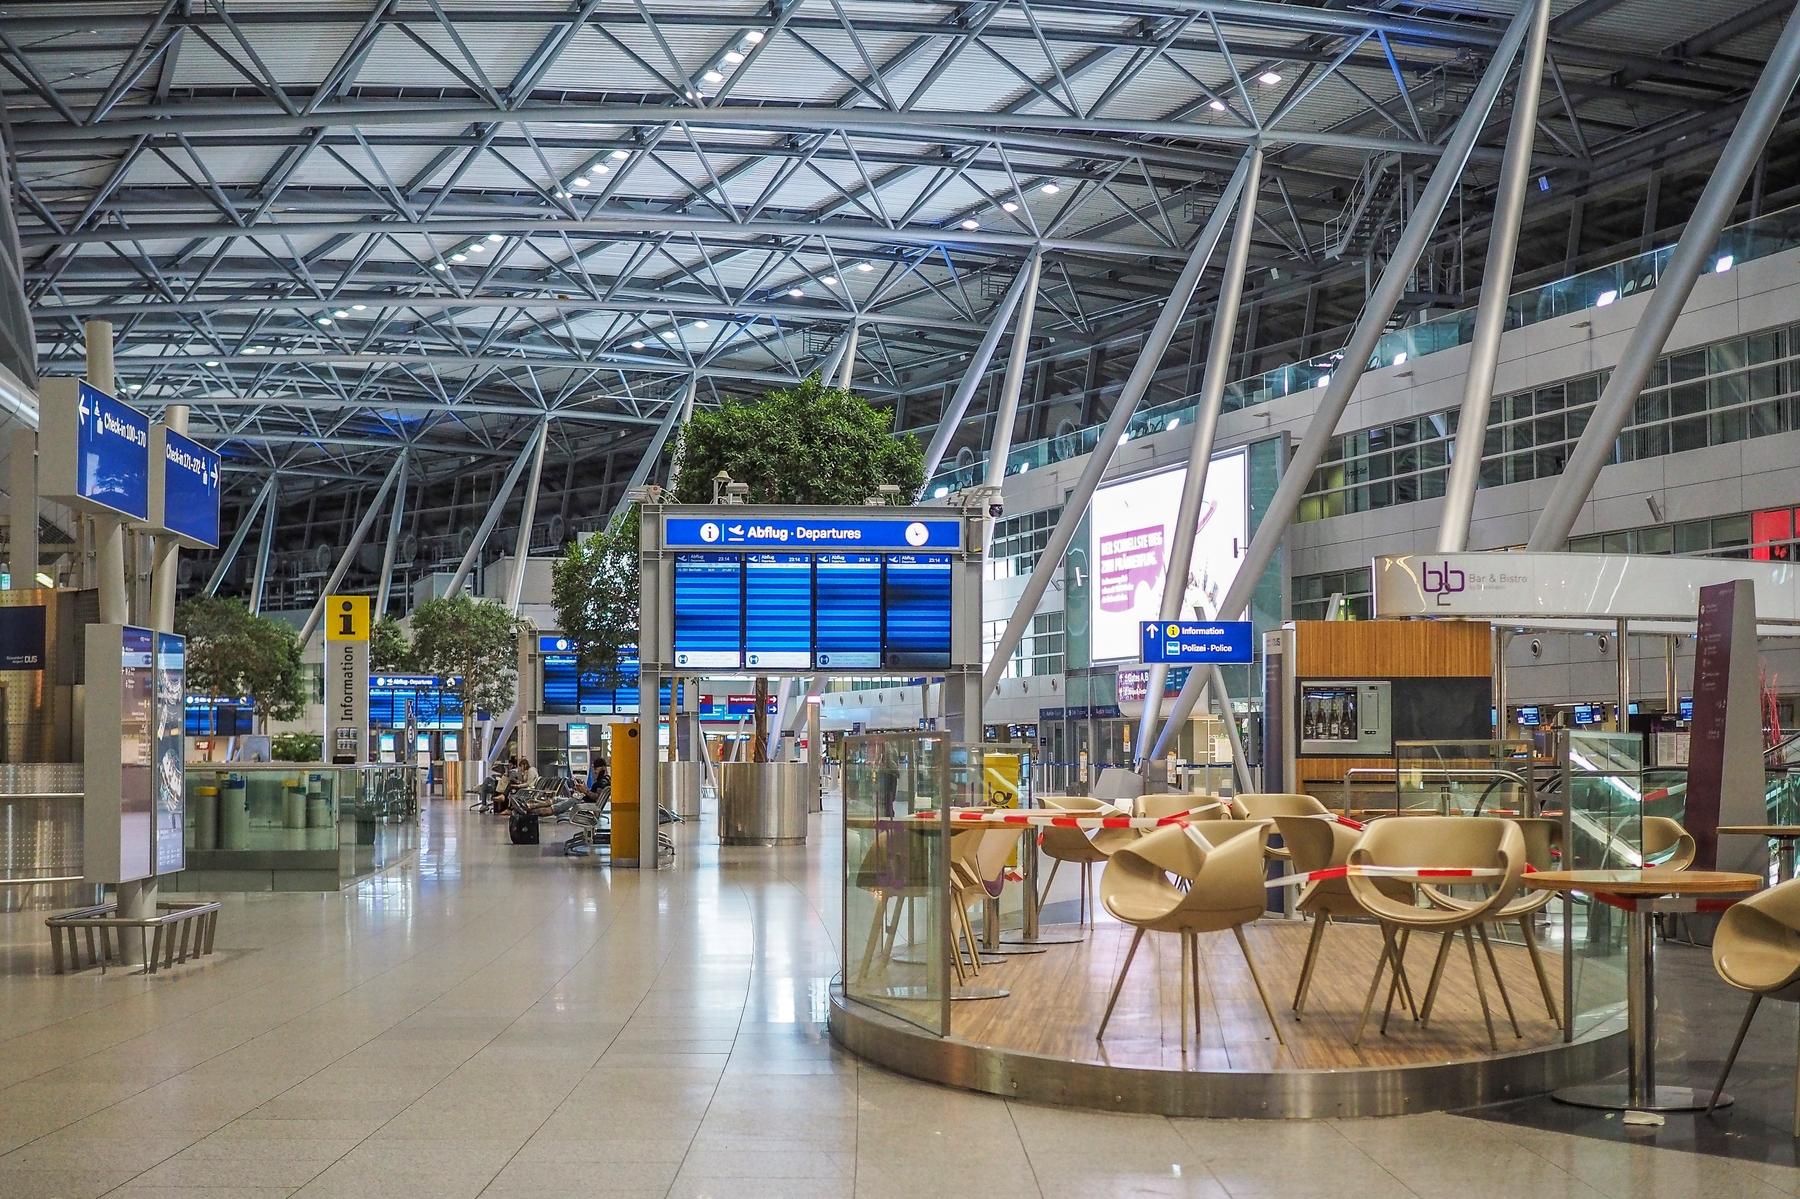 Flughäfen in Coronazeiten